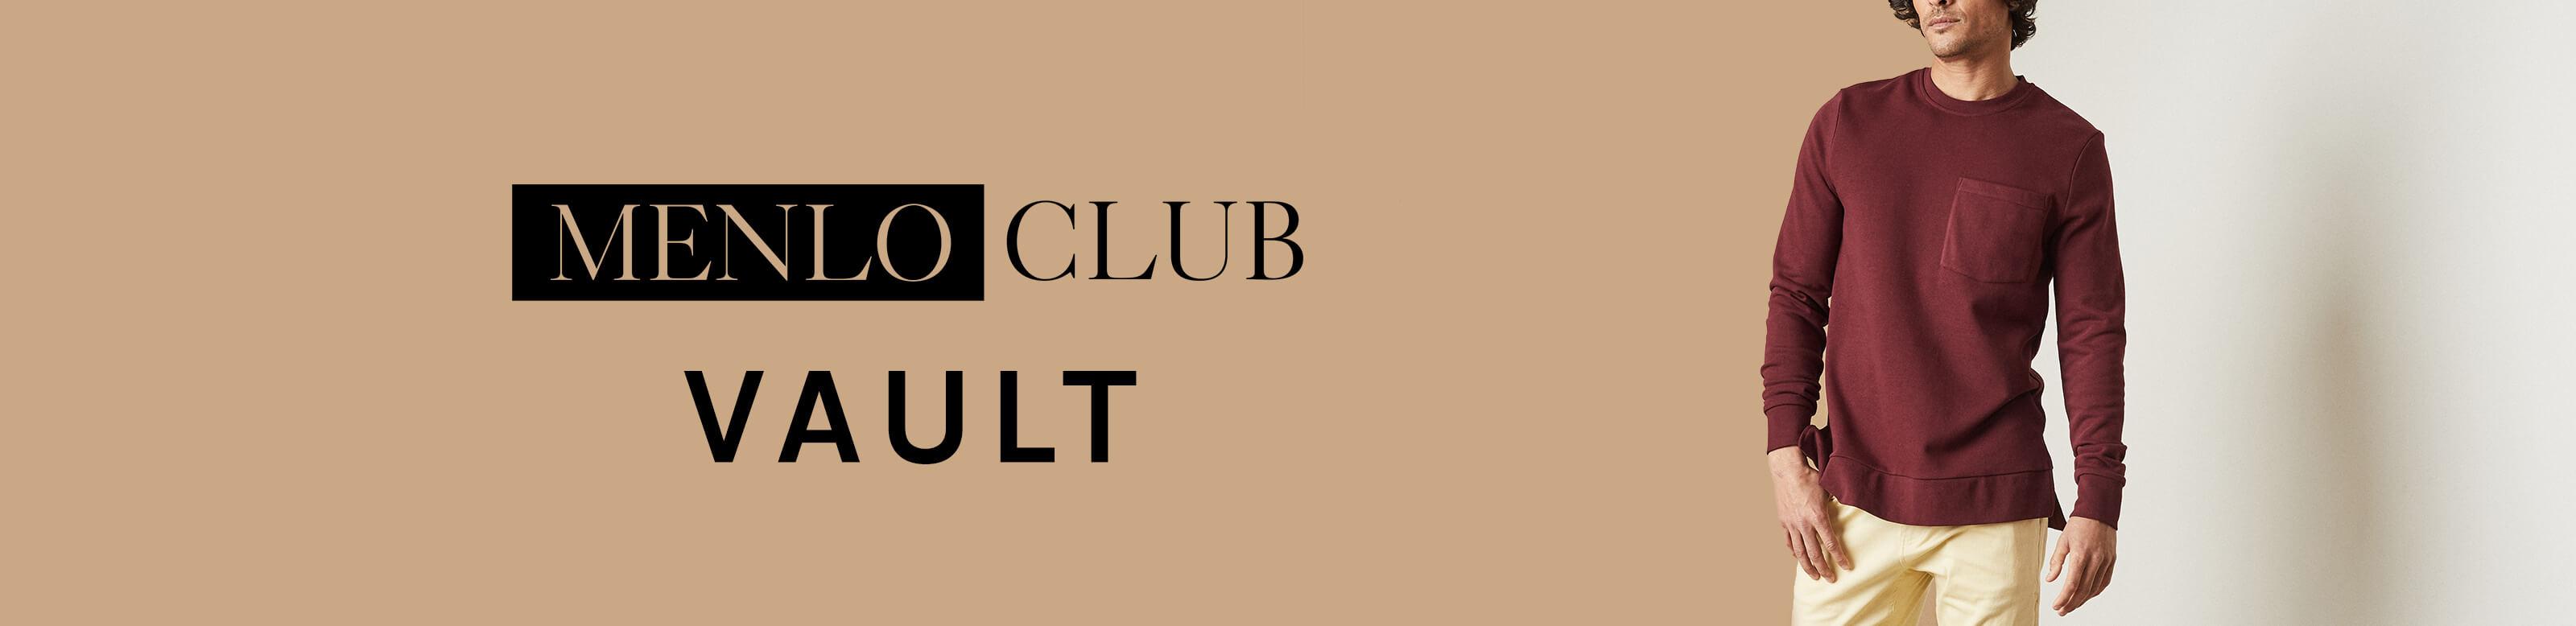 db976f7fb301e MENLO CLUB VAULT banner advertisement